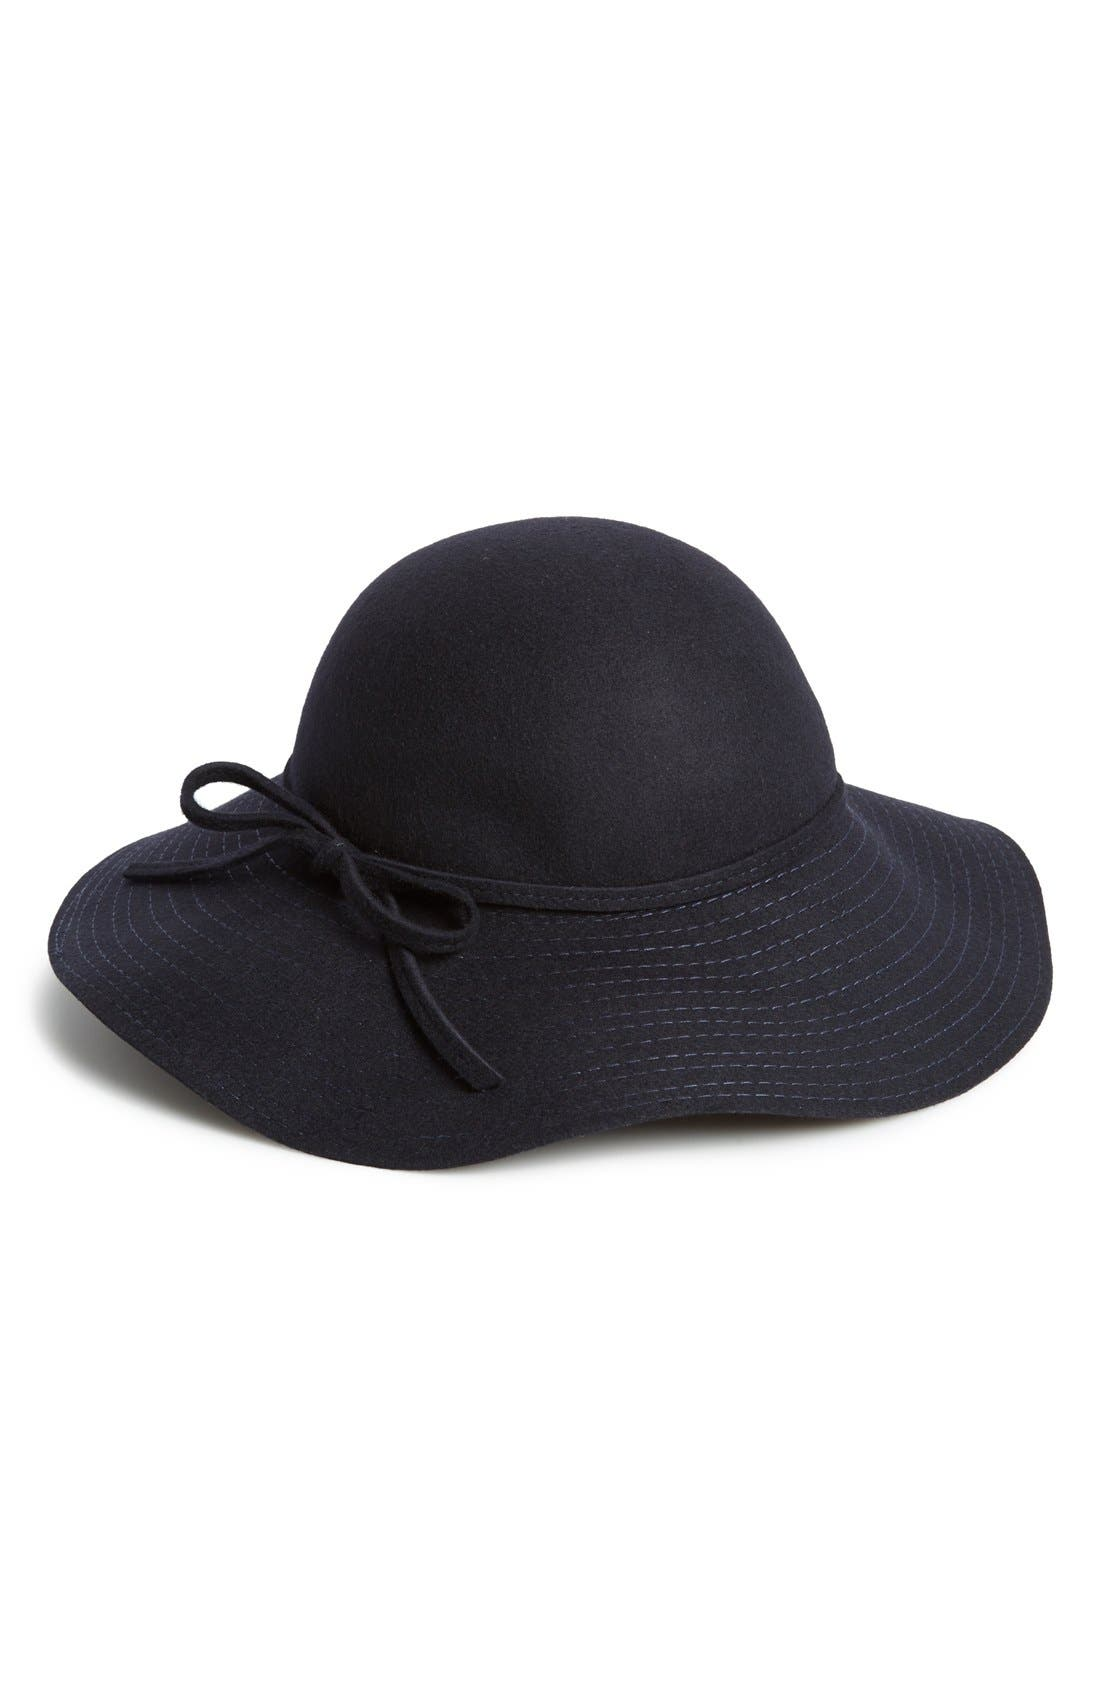 Alternate Image 1 Selected - Dorfman Pacific 'Sara Jess' Hat